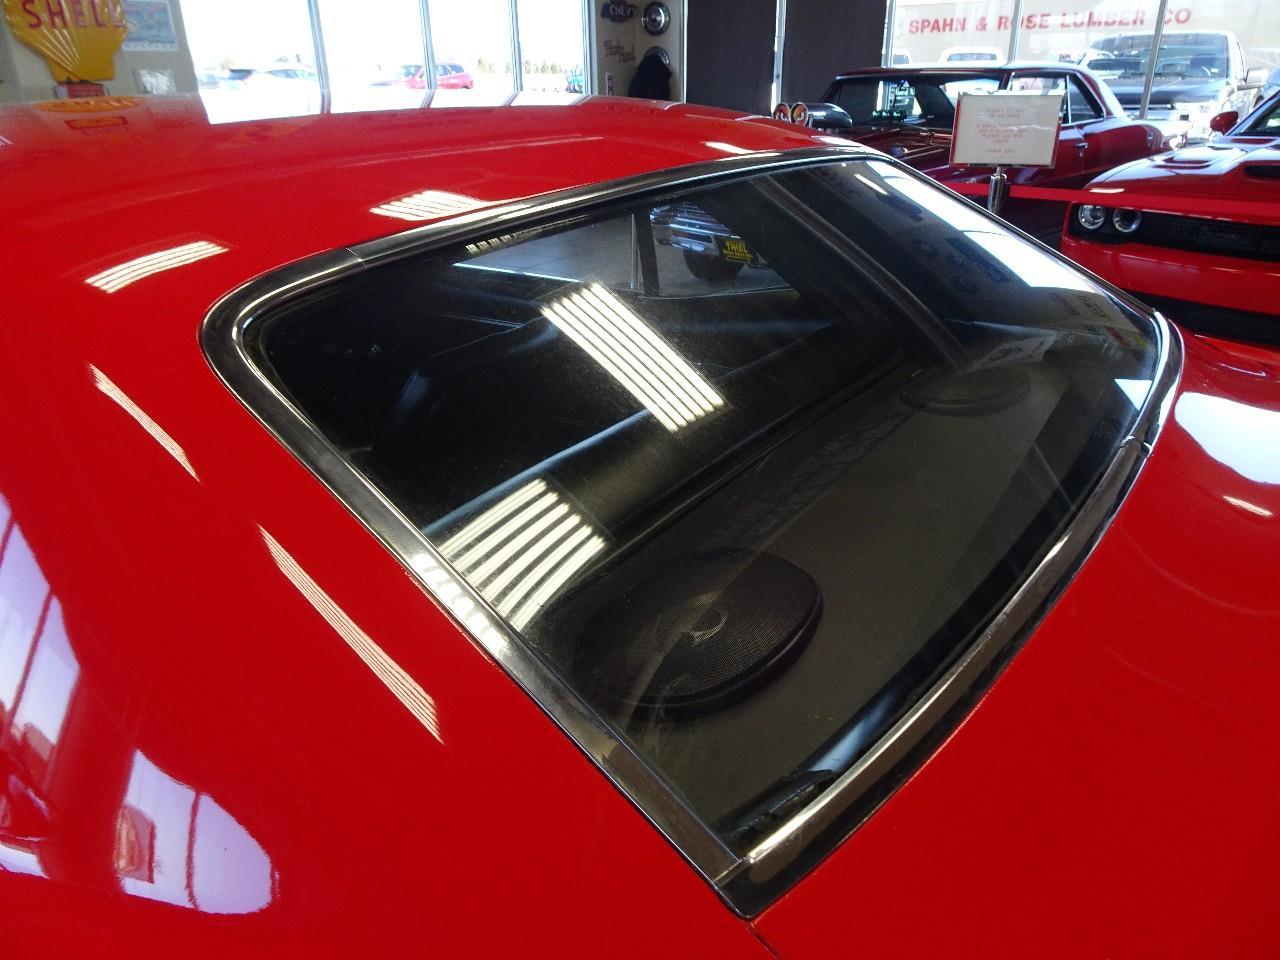 Large Picture of 1968 Camaro SS located in De Witt Iowa - $32,997.00 - P3YL